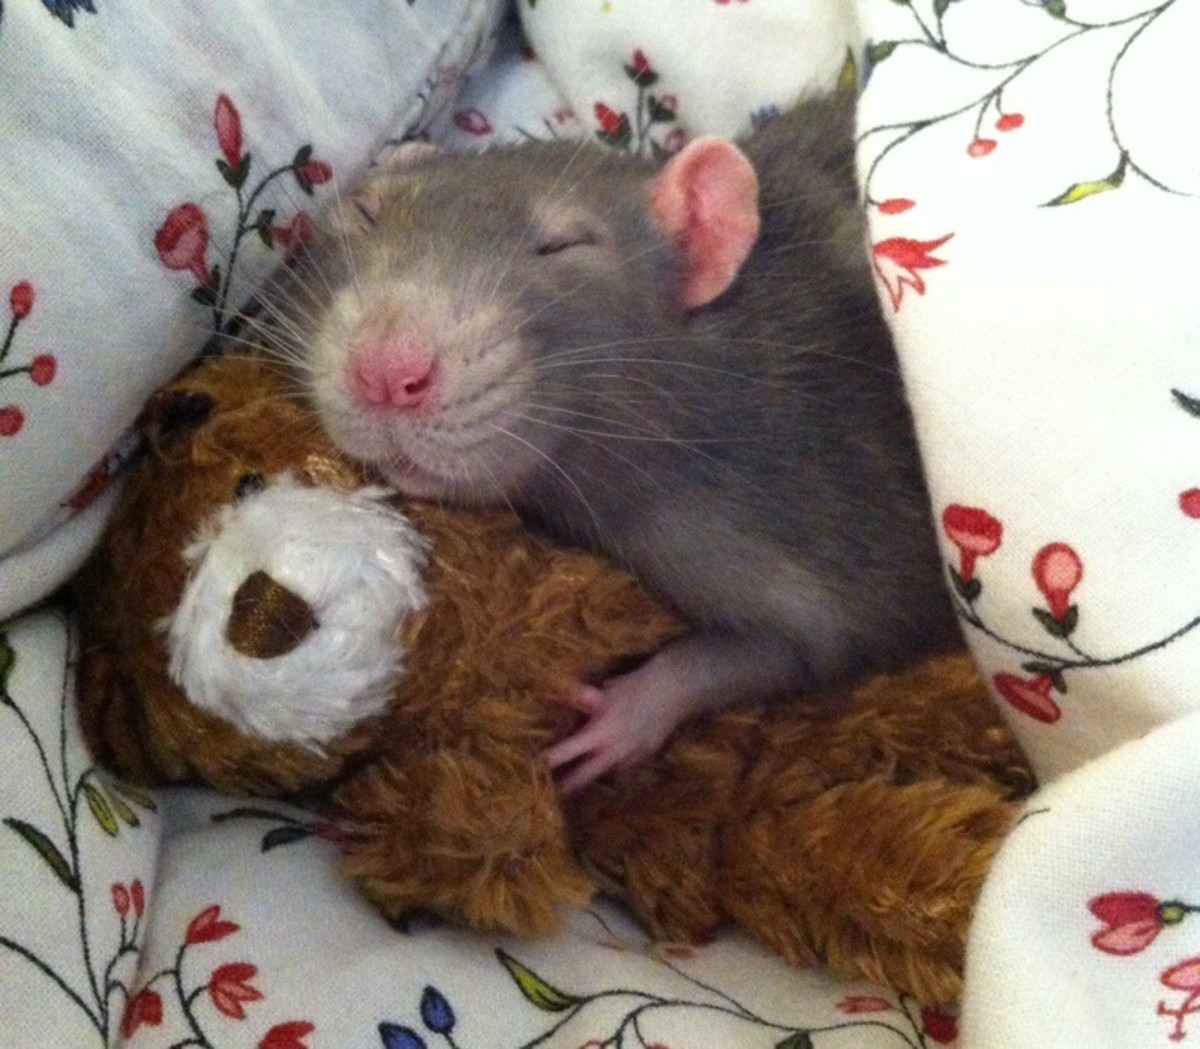 Are Rats Good Pets?